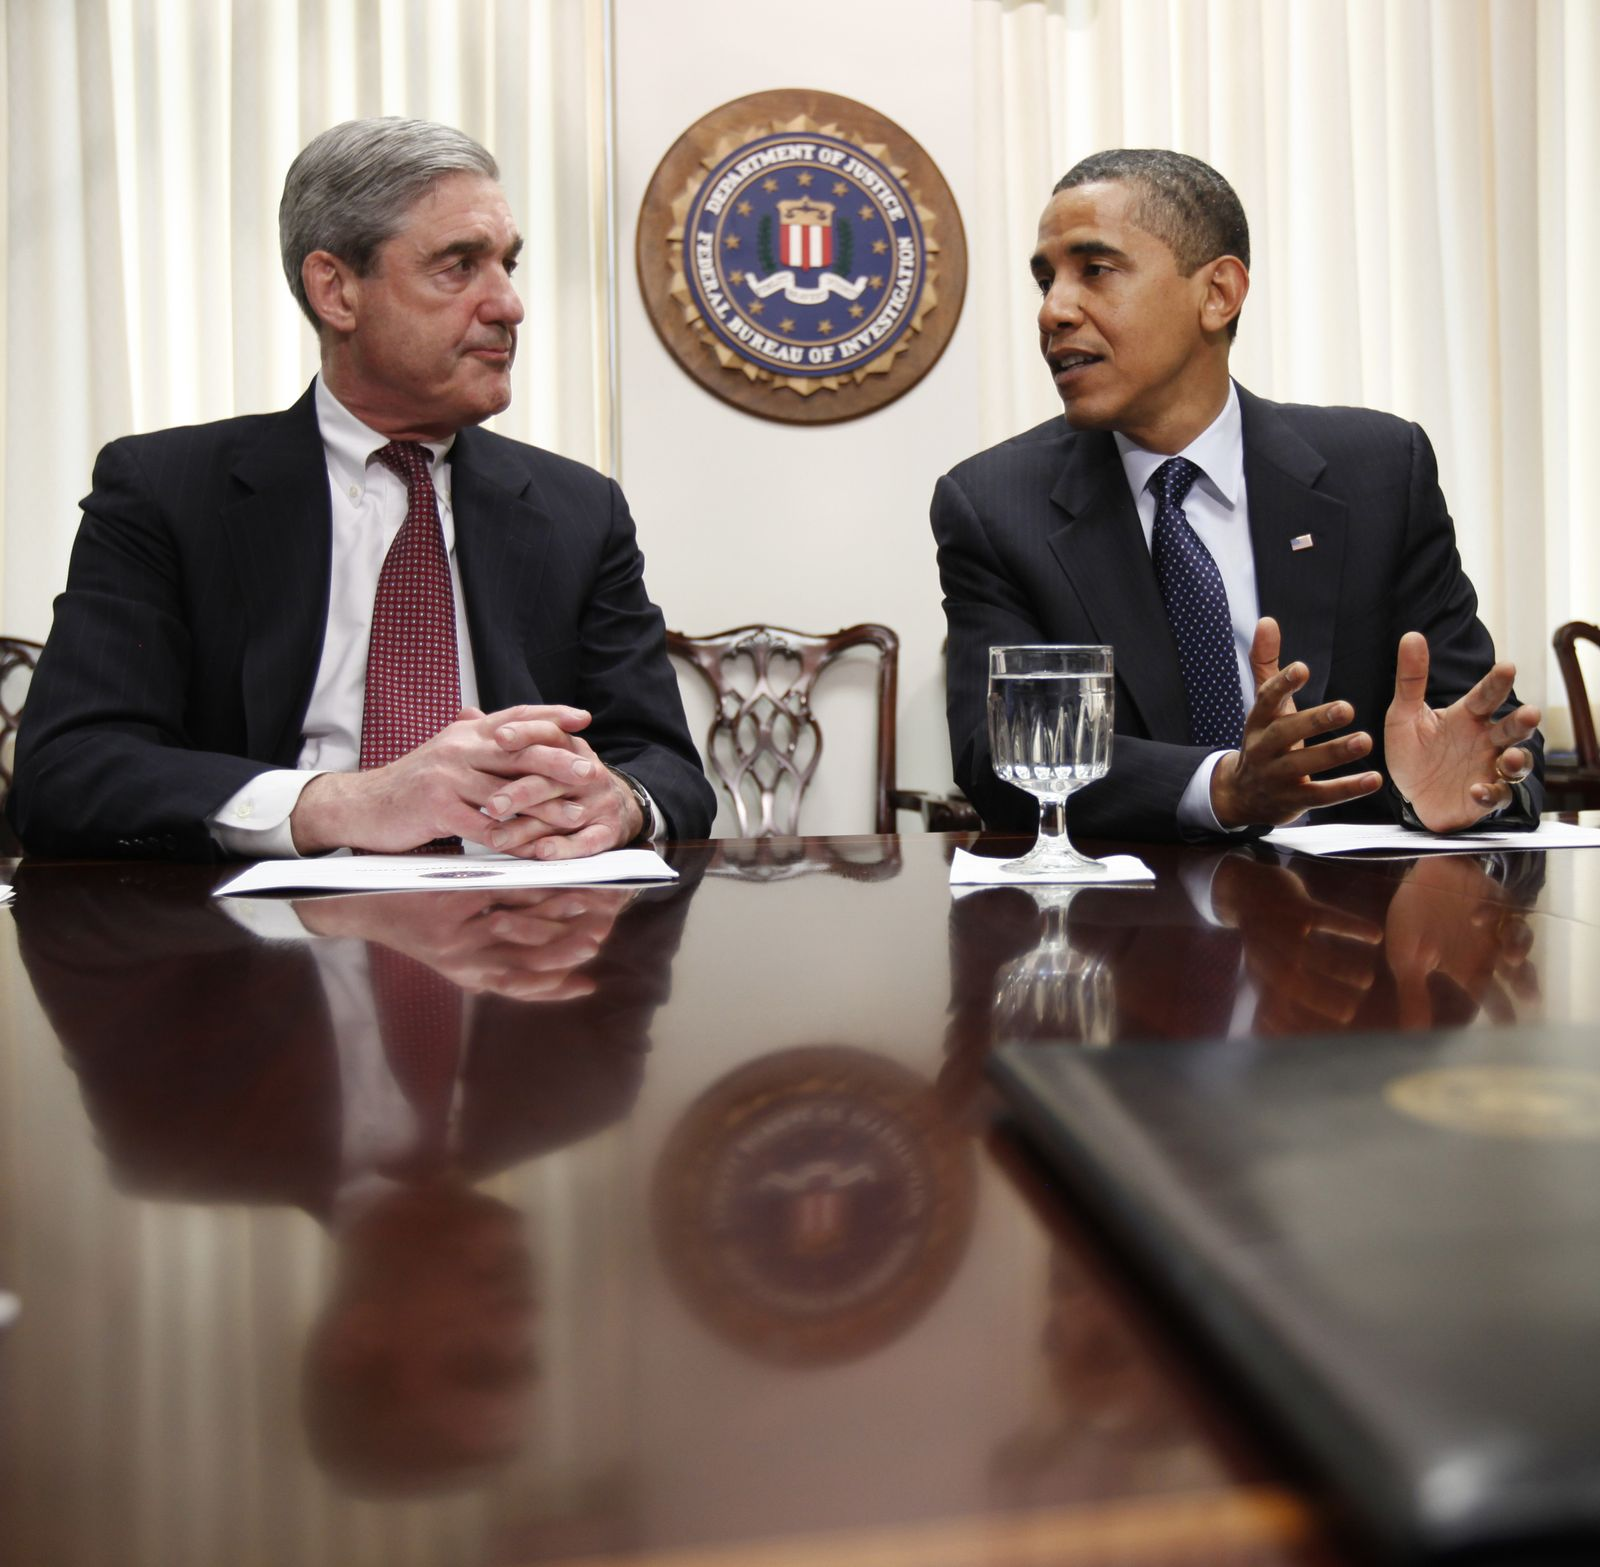 Obama FBI / Mueller